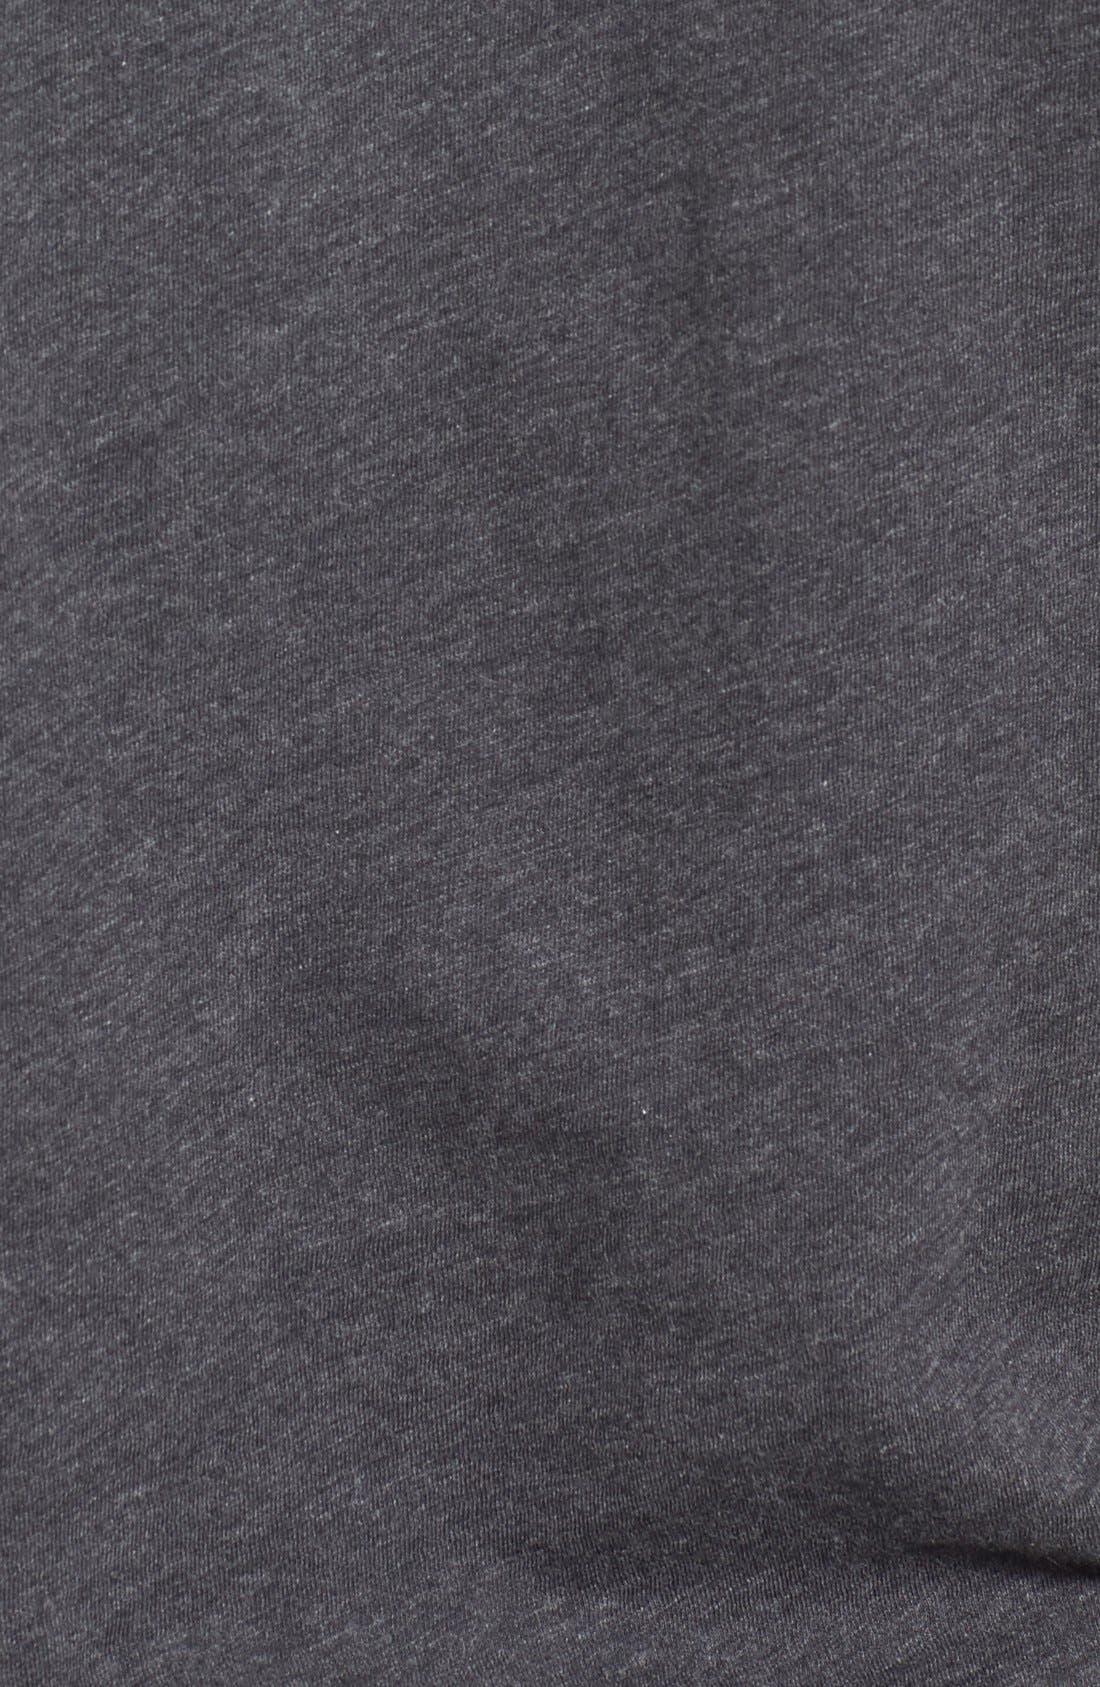 'Bing' V-Neck Pocket T-Shirt,                             Alternate thumbnail 10, color,